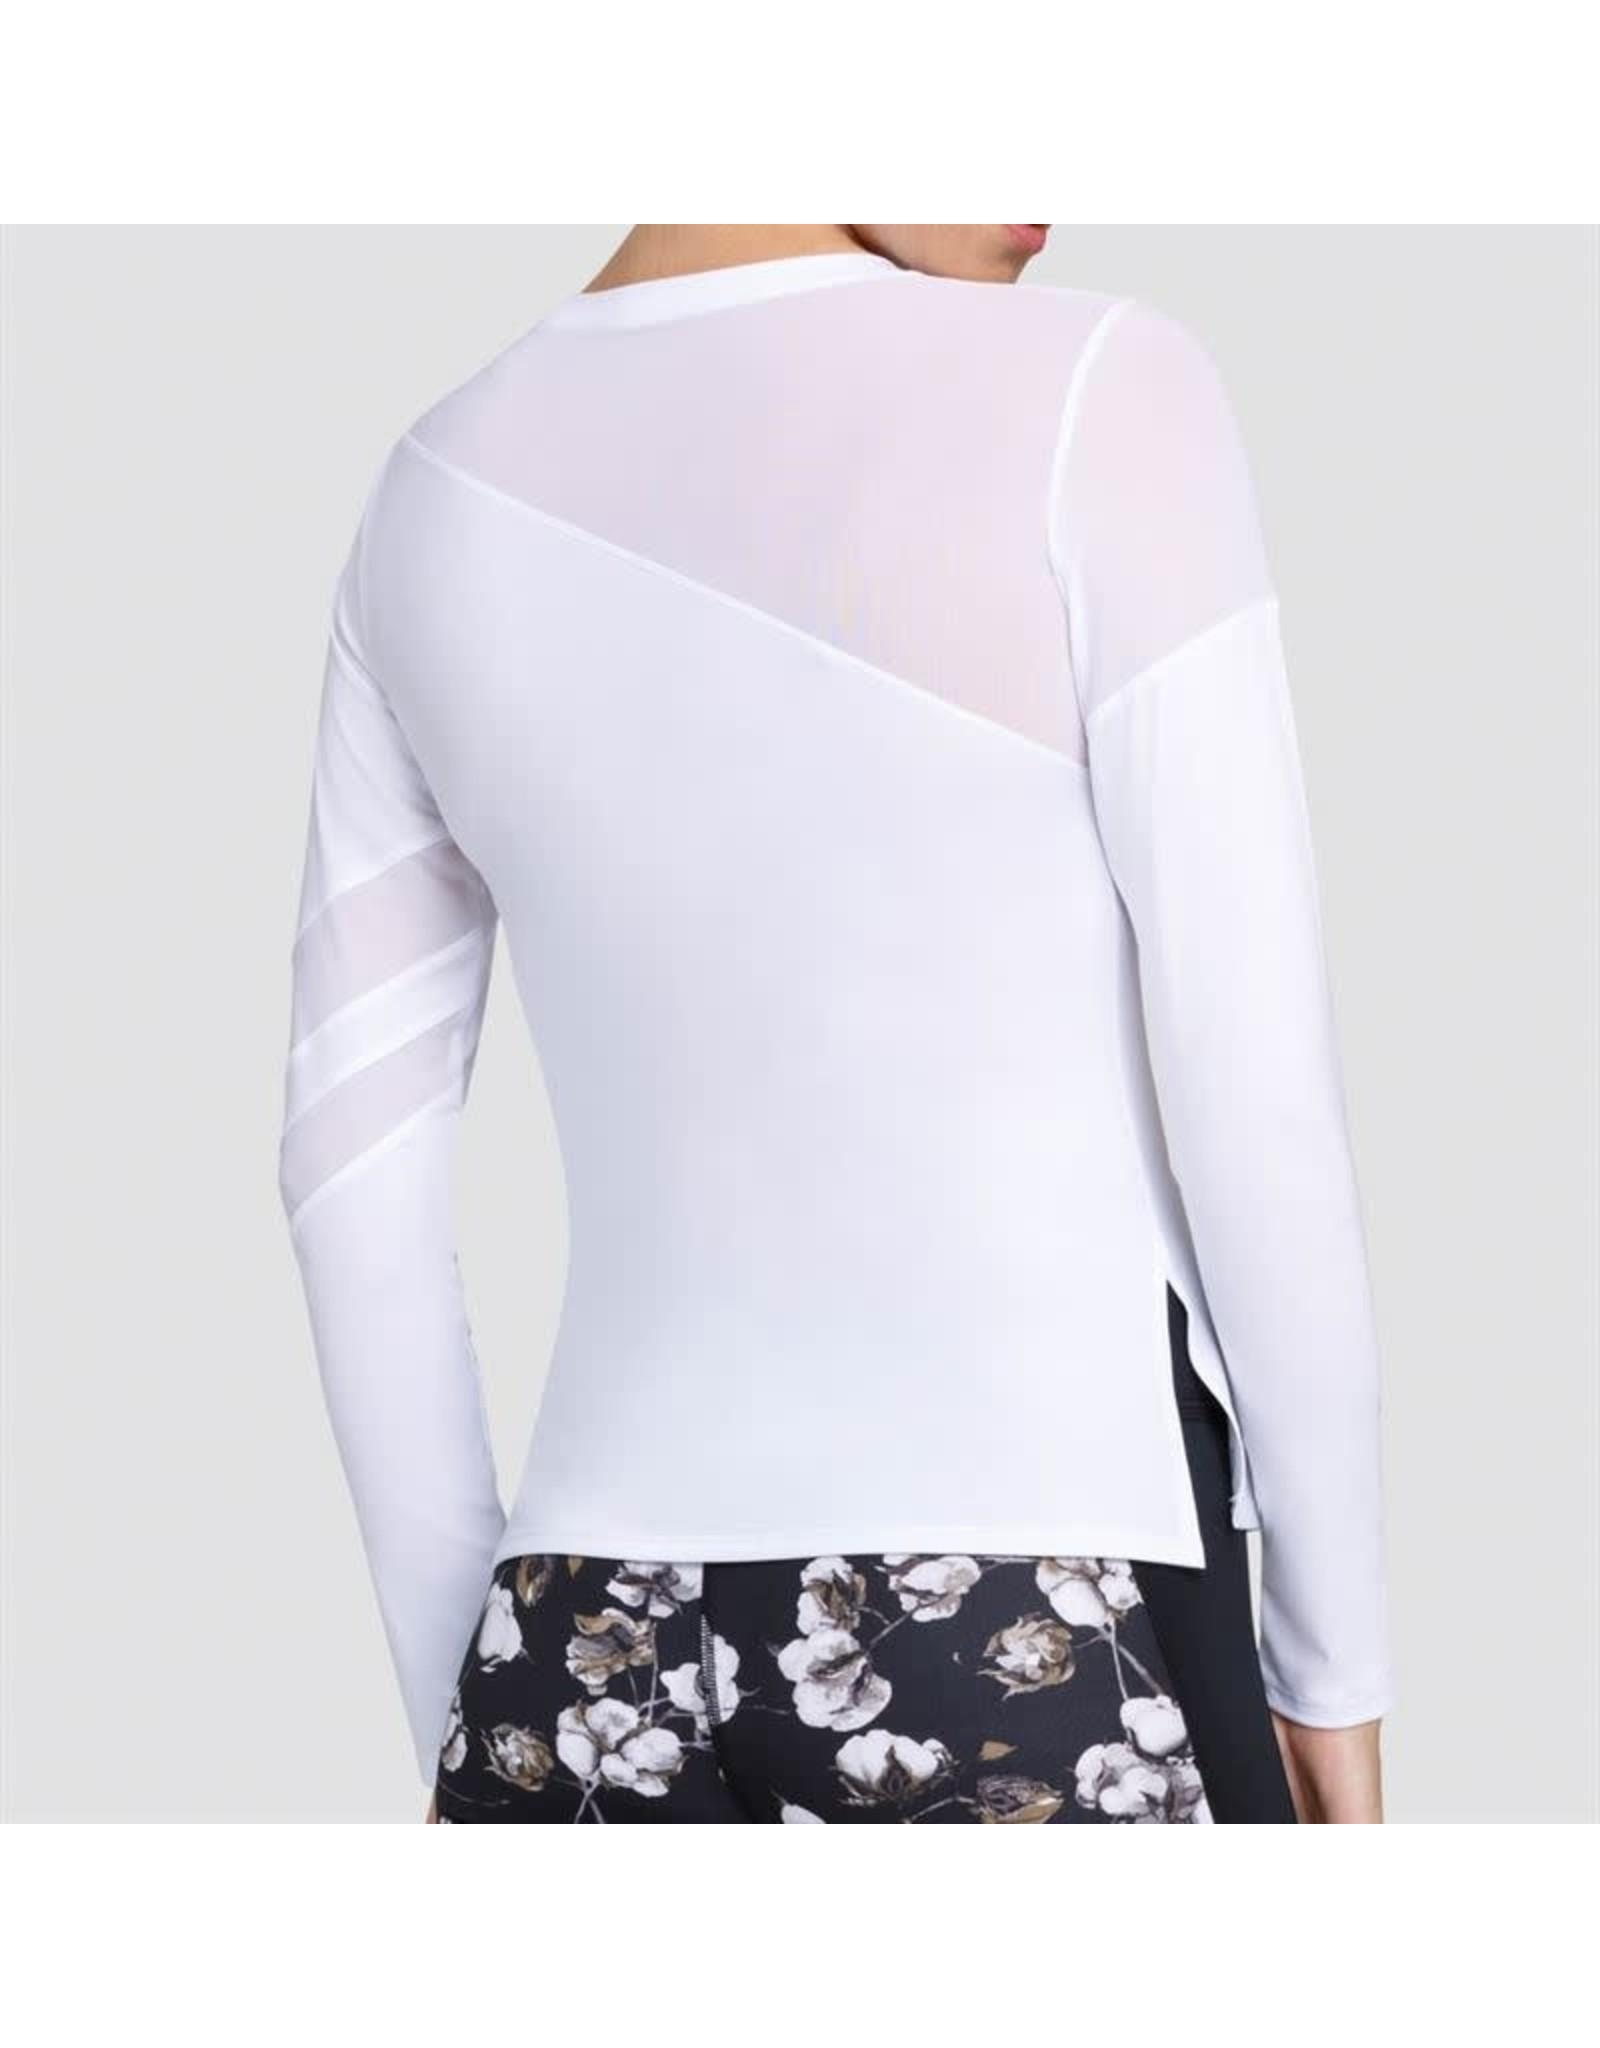 Tail Augusta Top - Chalk White